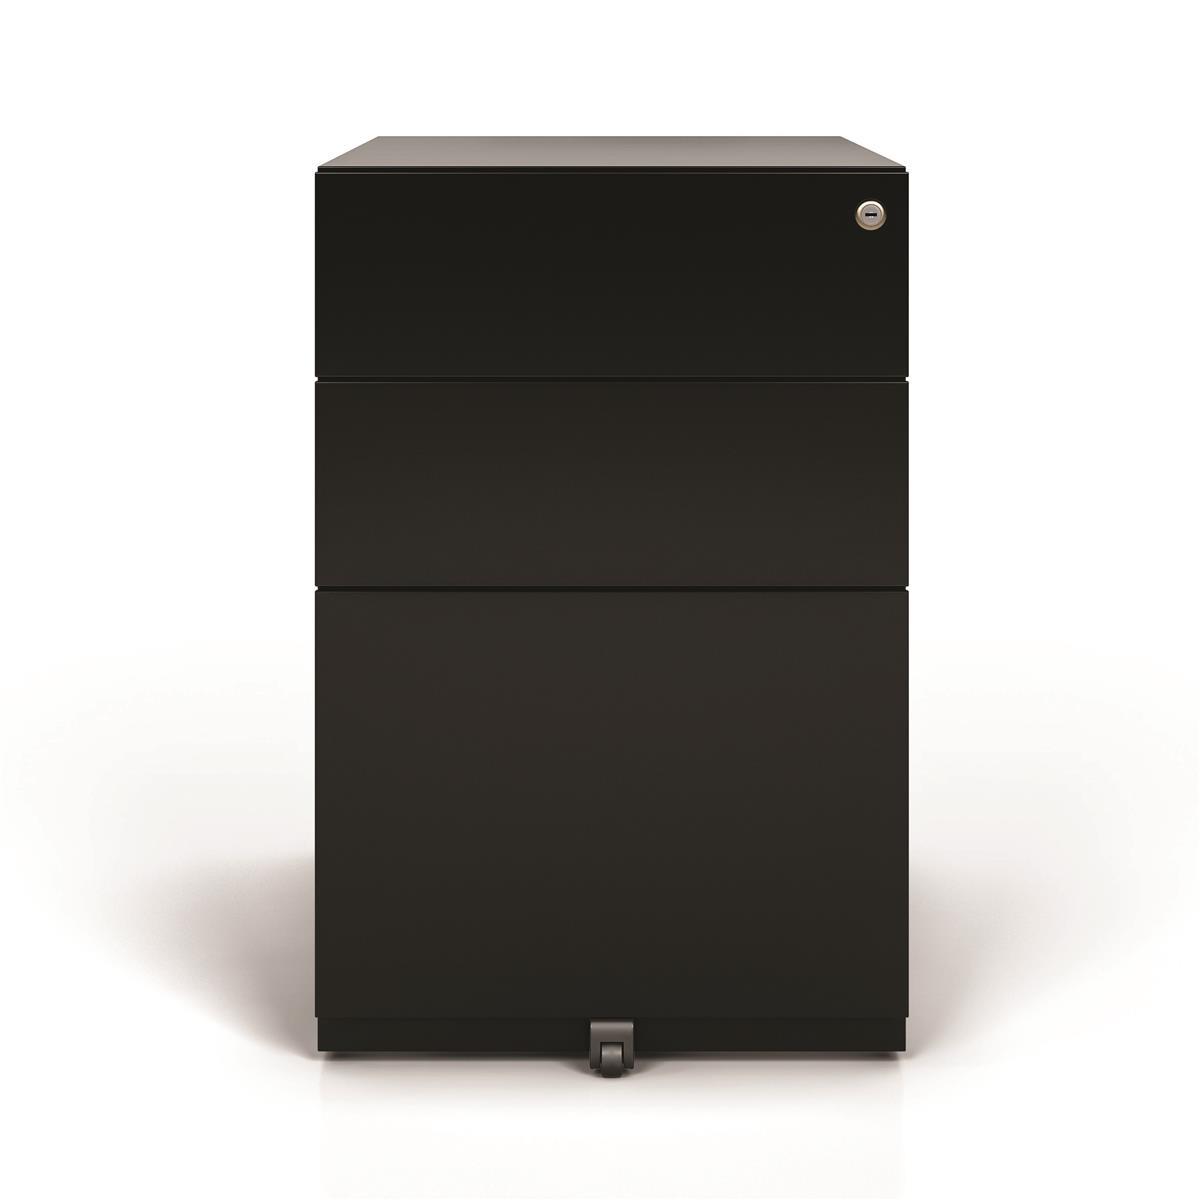 Pedestals Sonix 3 Drawer Tall Under Desk Filing Pedestal 420x565x645mm Black Ref NWA52M7SSF-av1